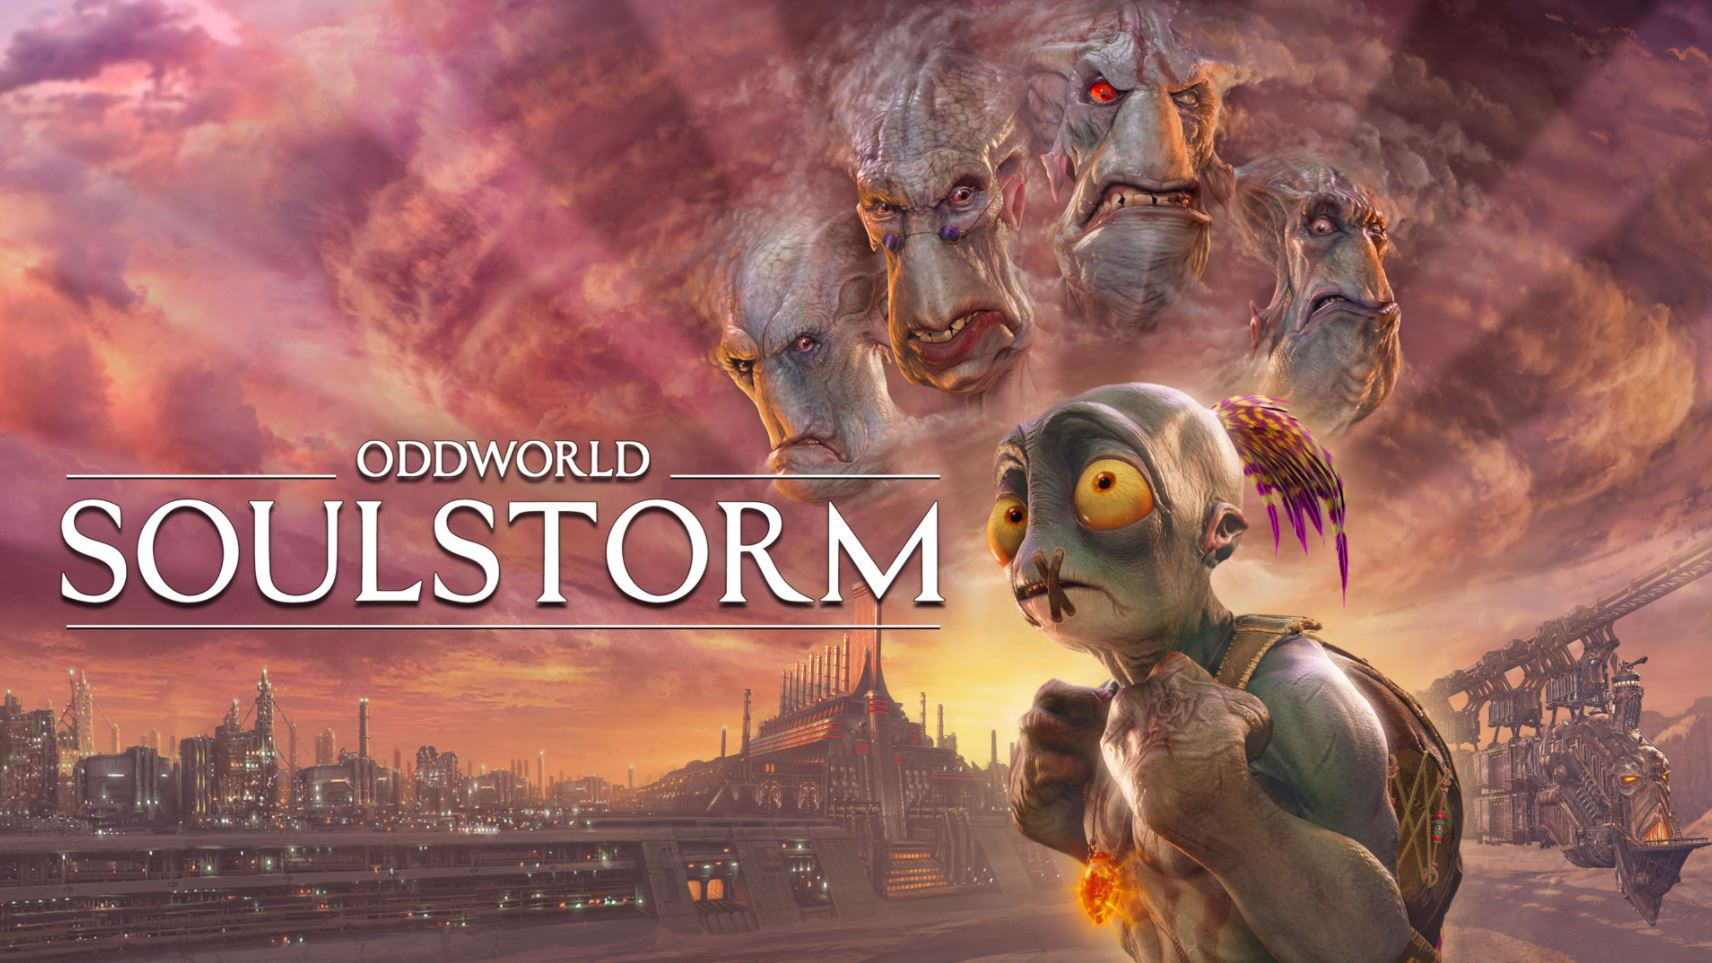 oddworld-soulstorm-news-reviews-videos